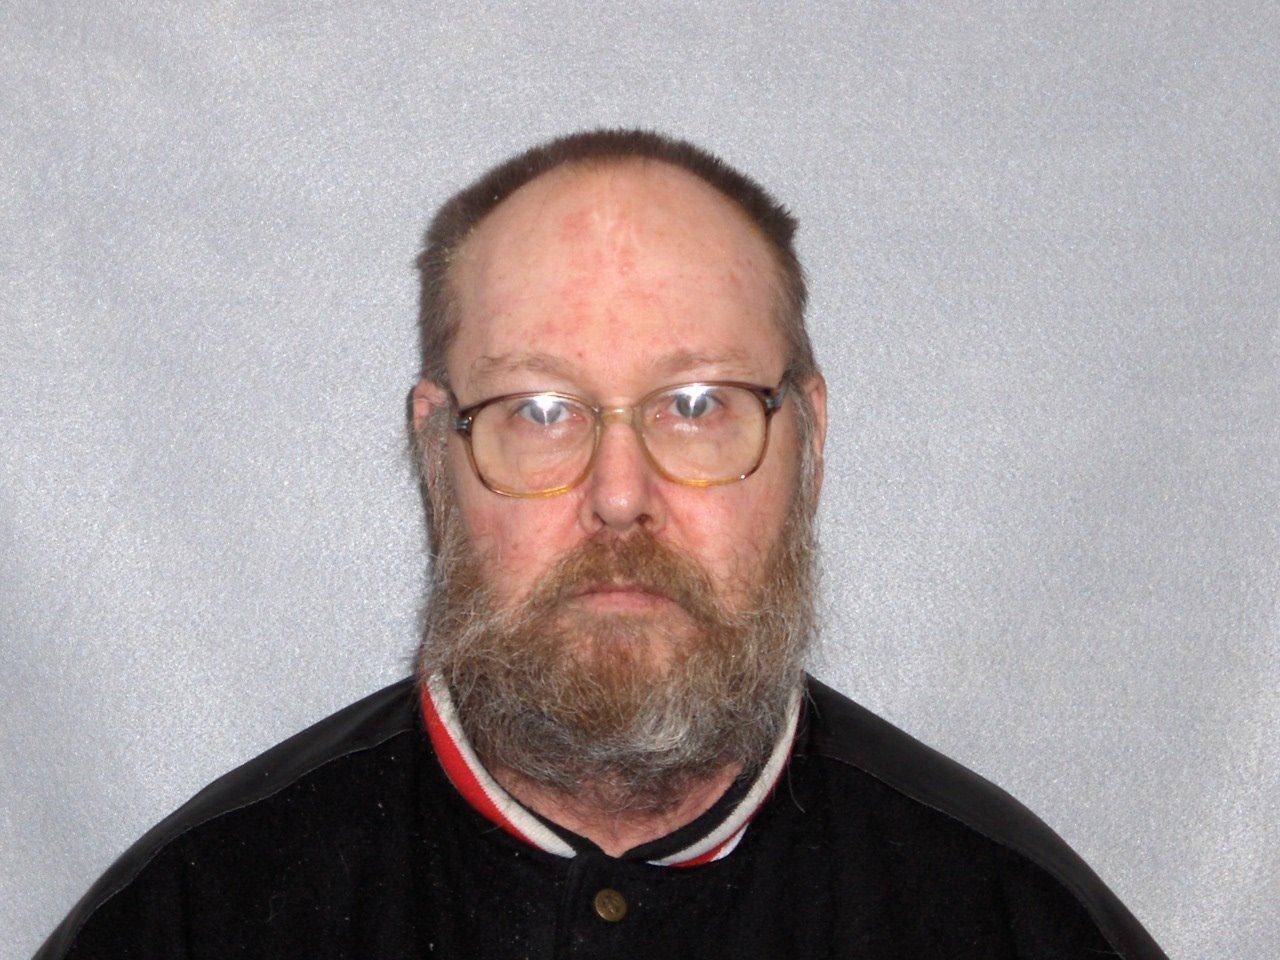 Lucas county sex offenders list